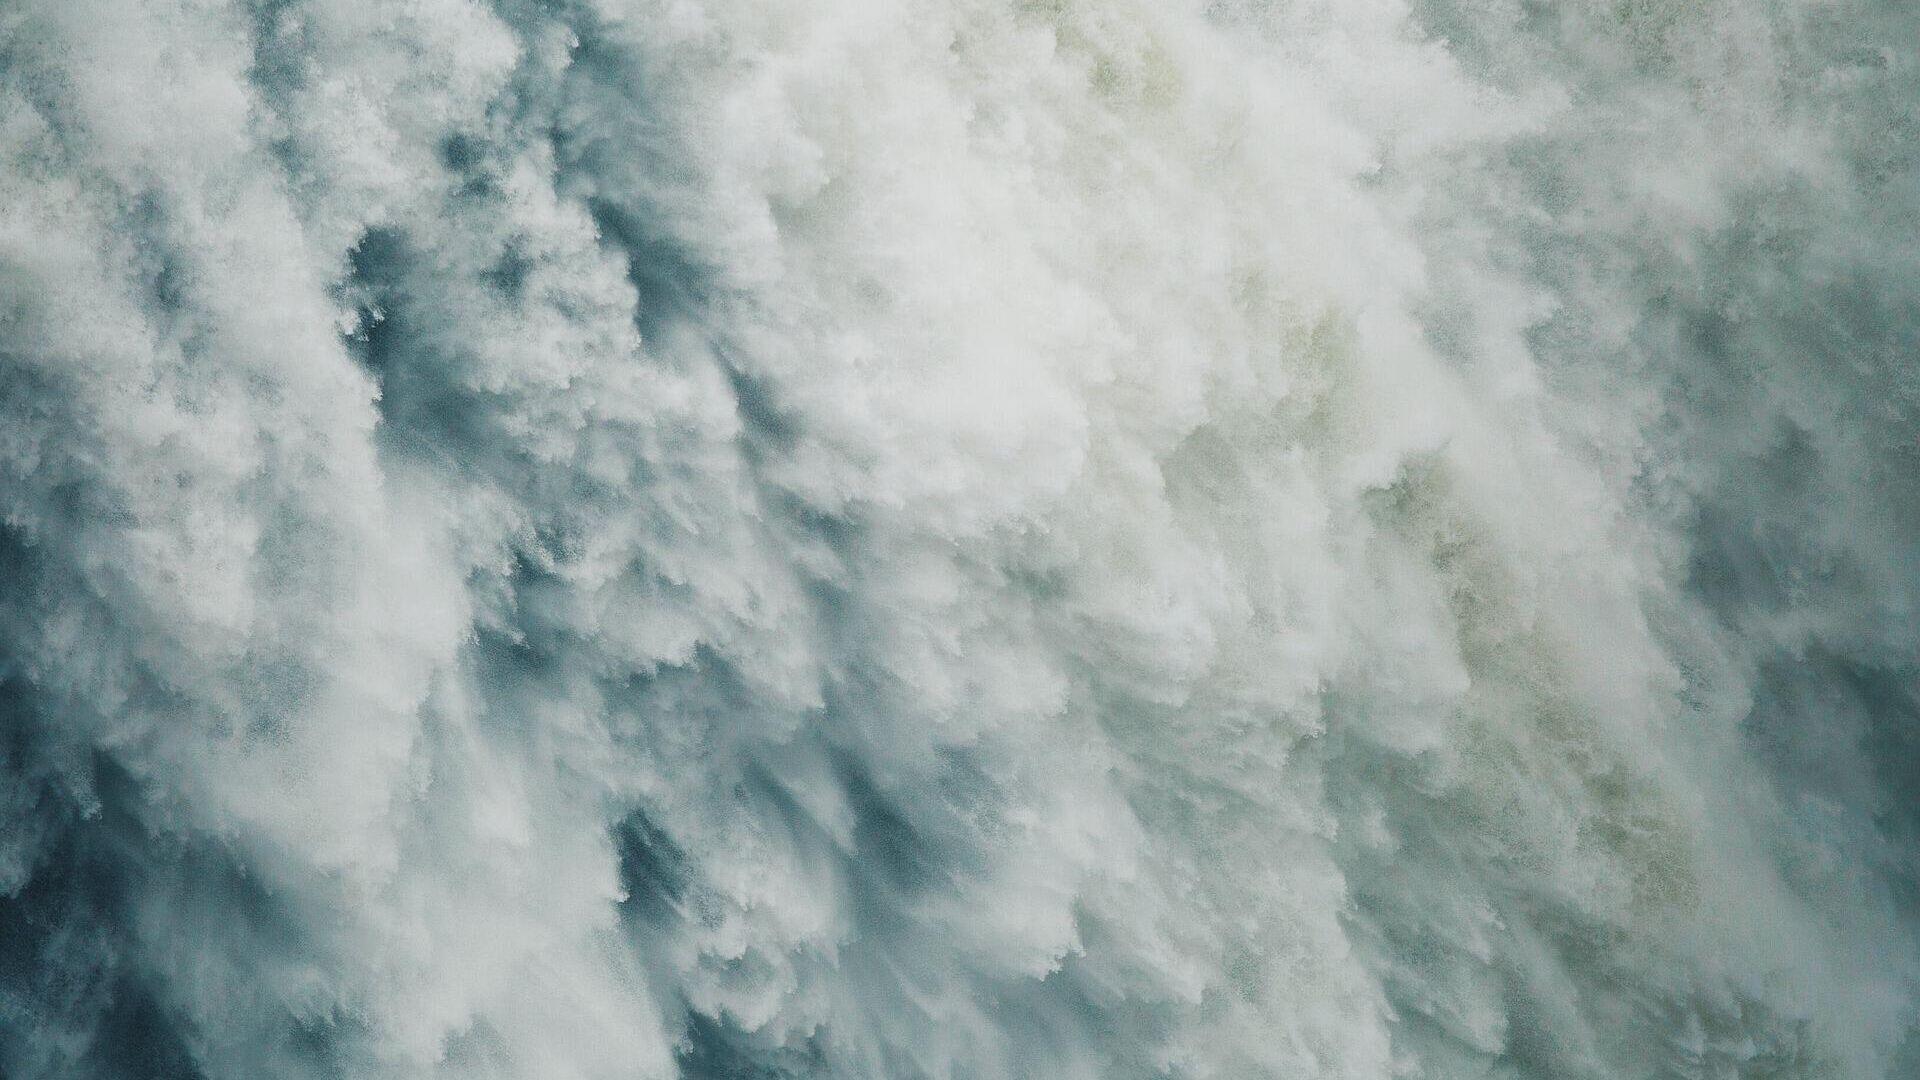 Wasserfall (Symbolbild) - SNA, 1920, 19.04.2021